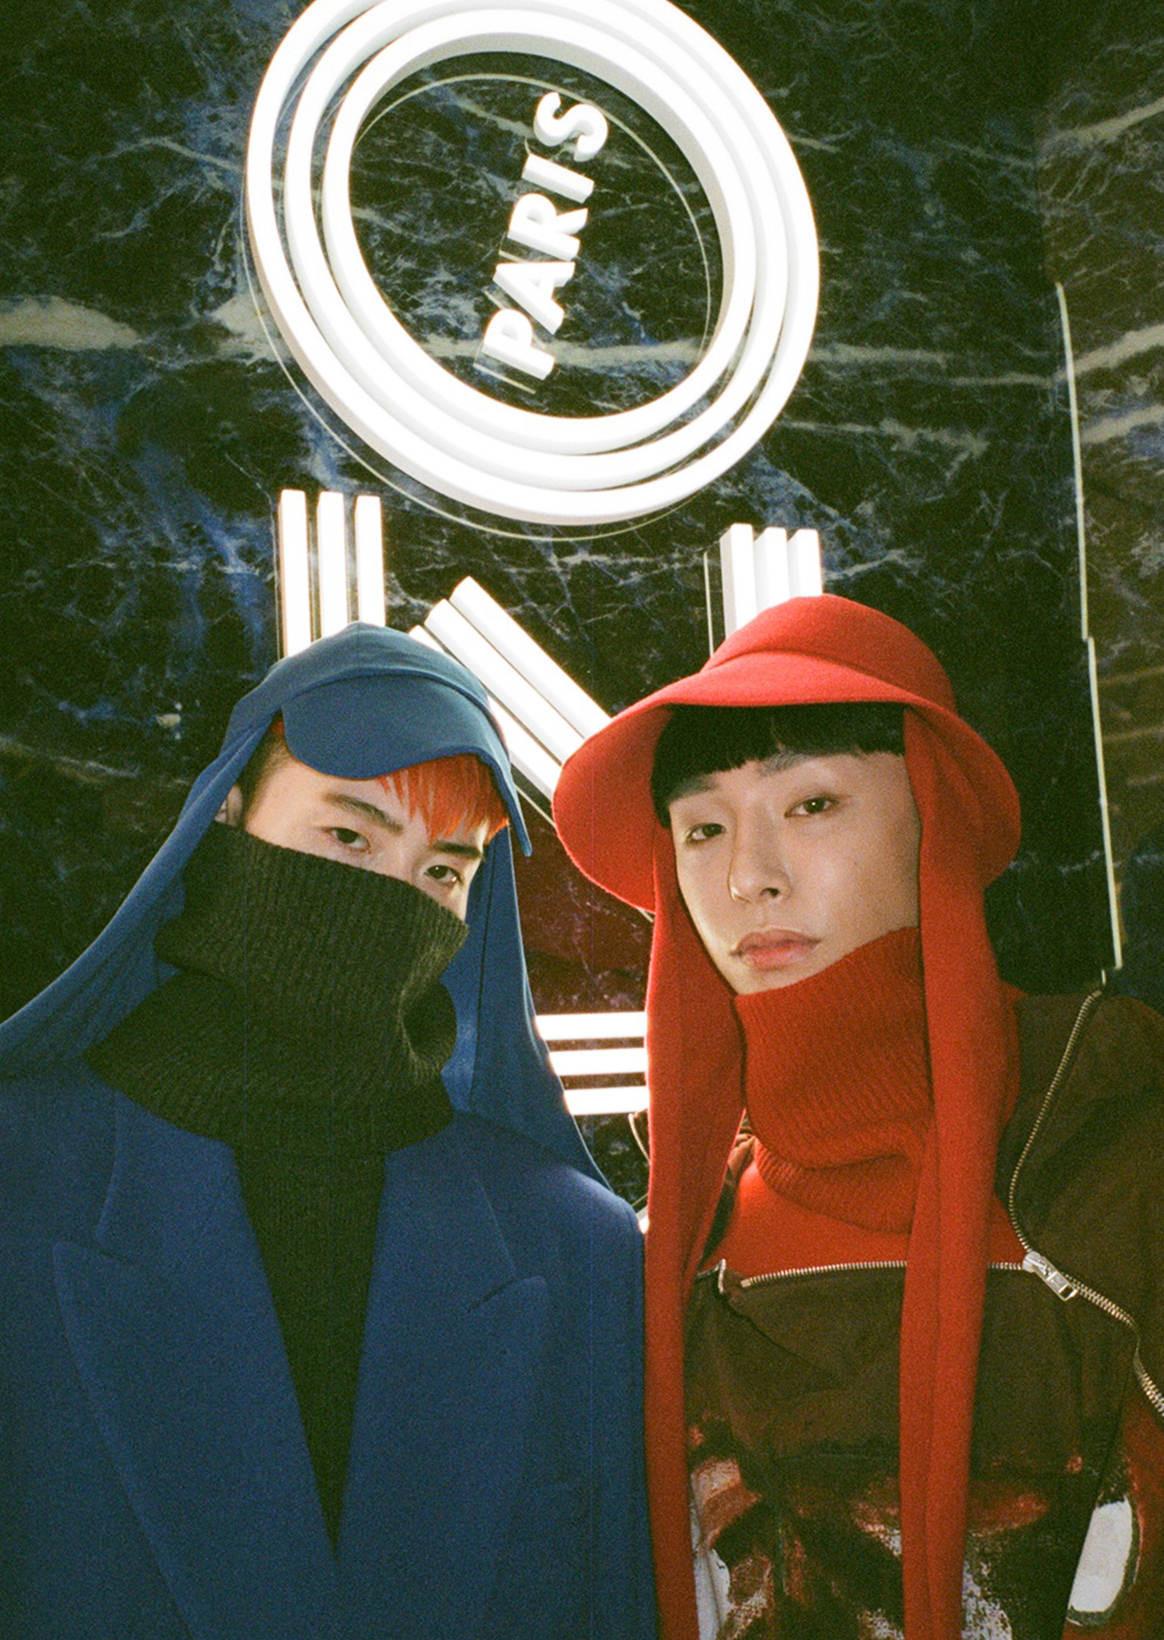 TAIKI&NOAH X KENZO/AMBUSH®WORKSHOP 2 | For fashion week feeling to Shibuya PARCO